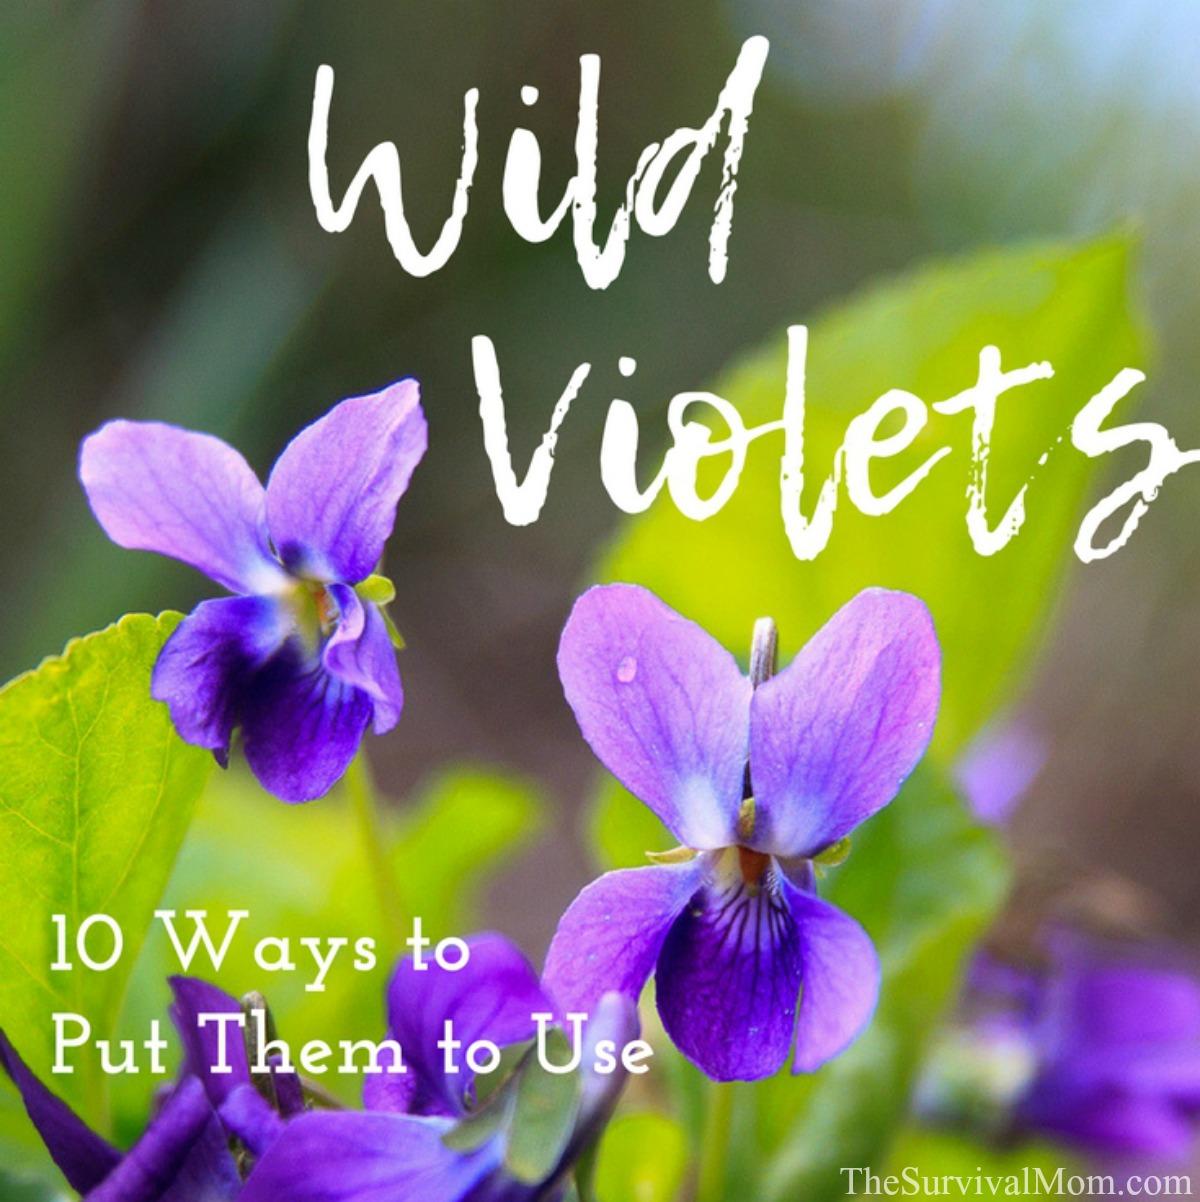 wild violets, wild violet weed,how to use wild violet, wild violet control